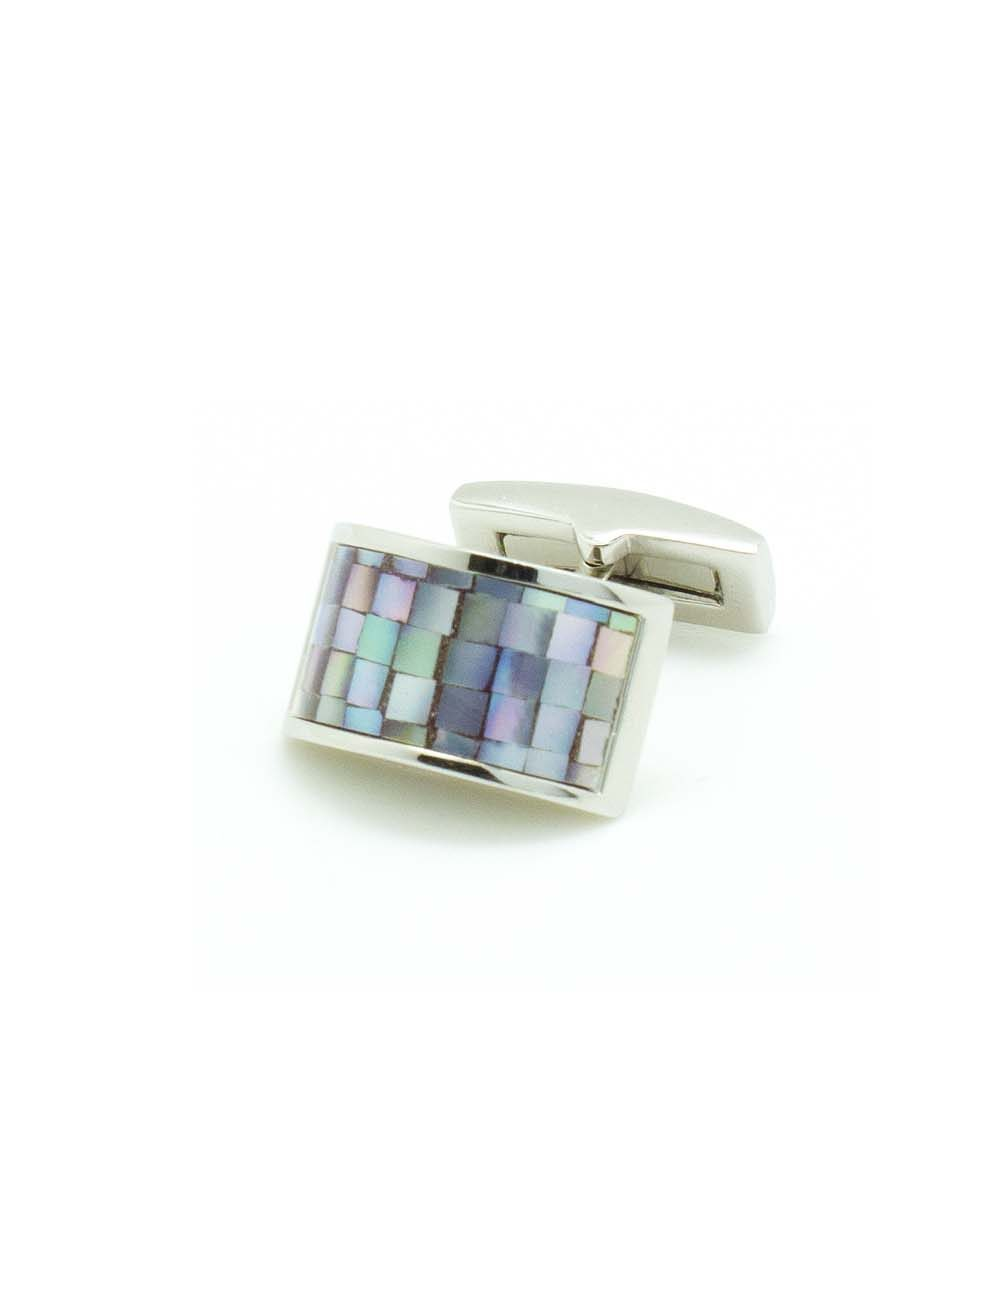 Light Purple Mosaic Tiles Pearl with Half Round Rectangular Cufflink - C131FP-043B